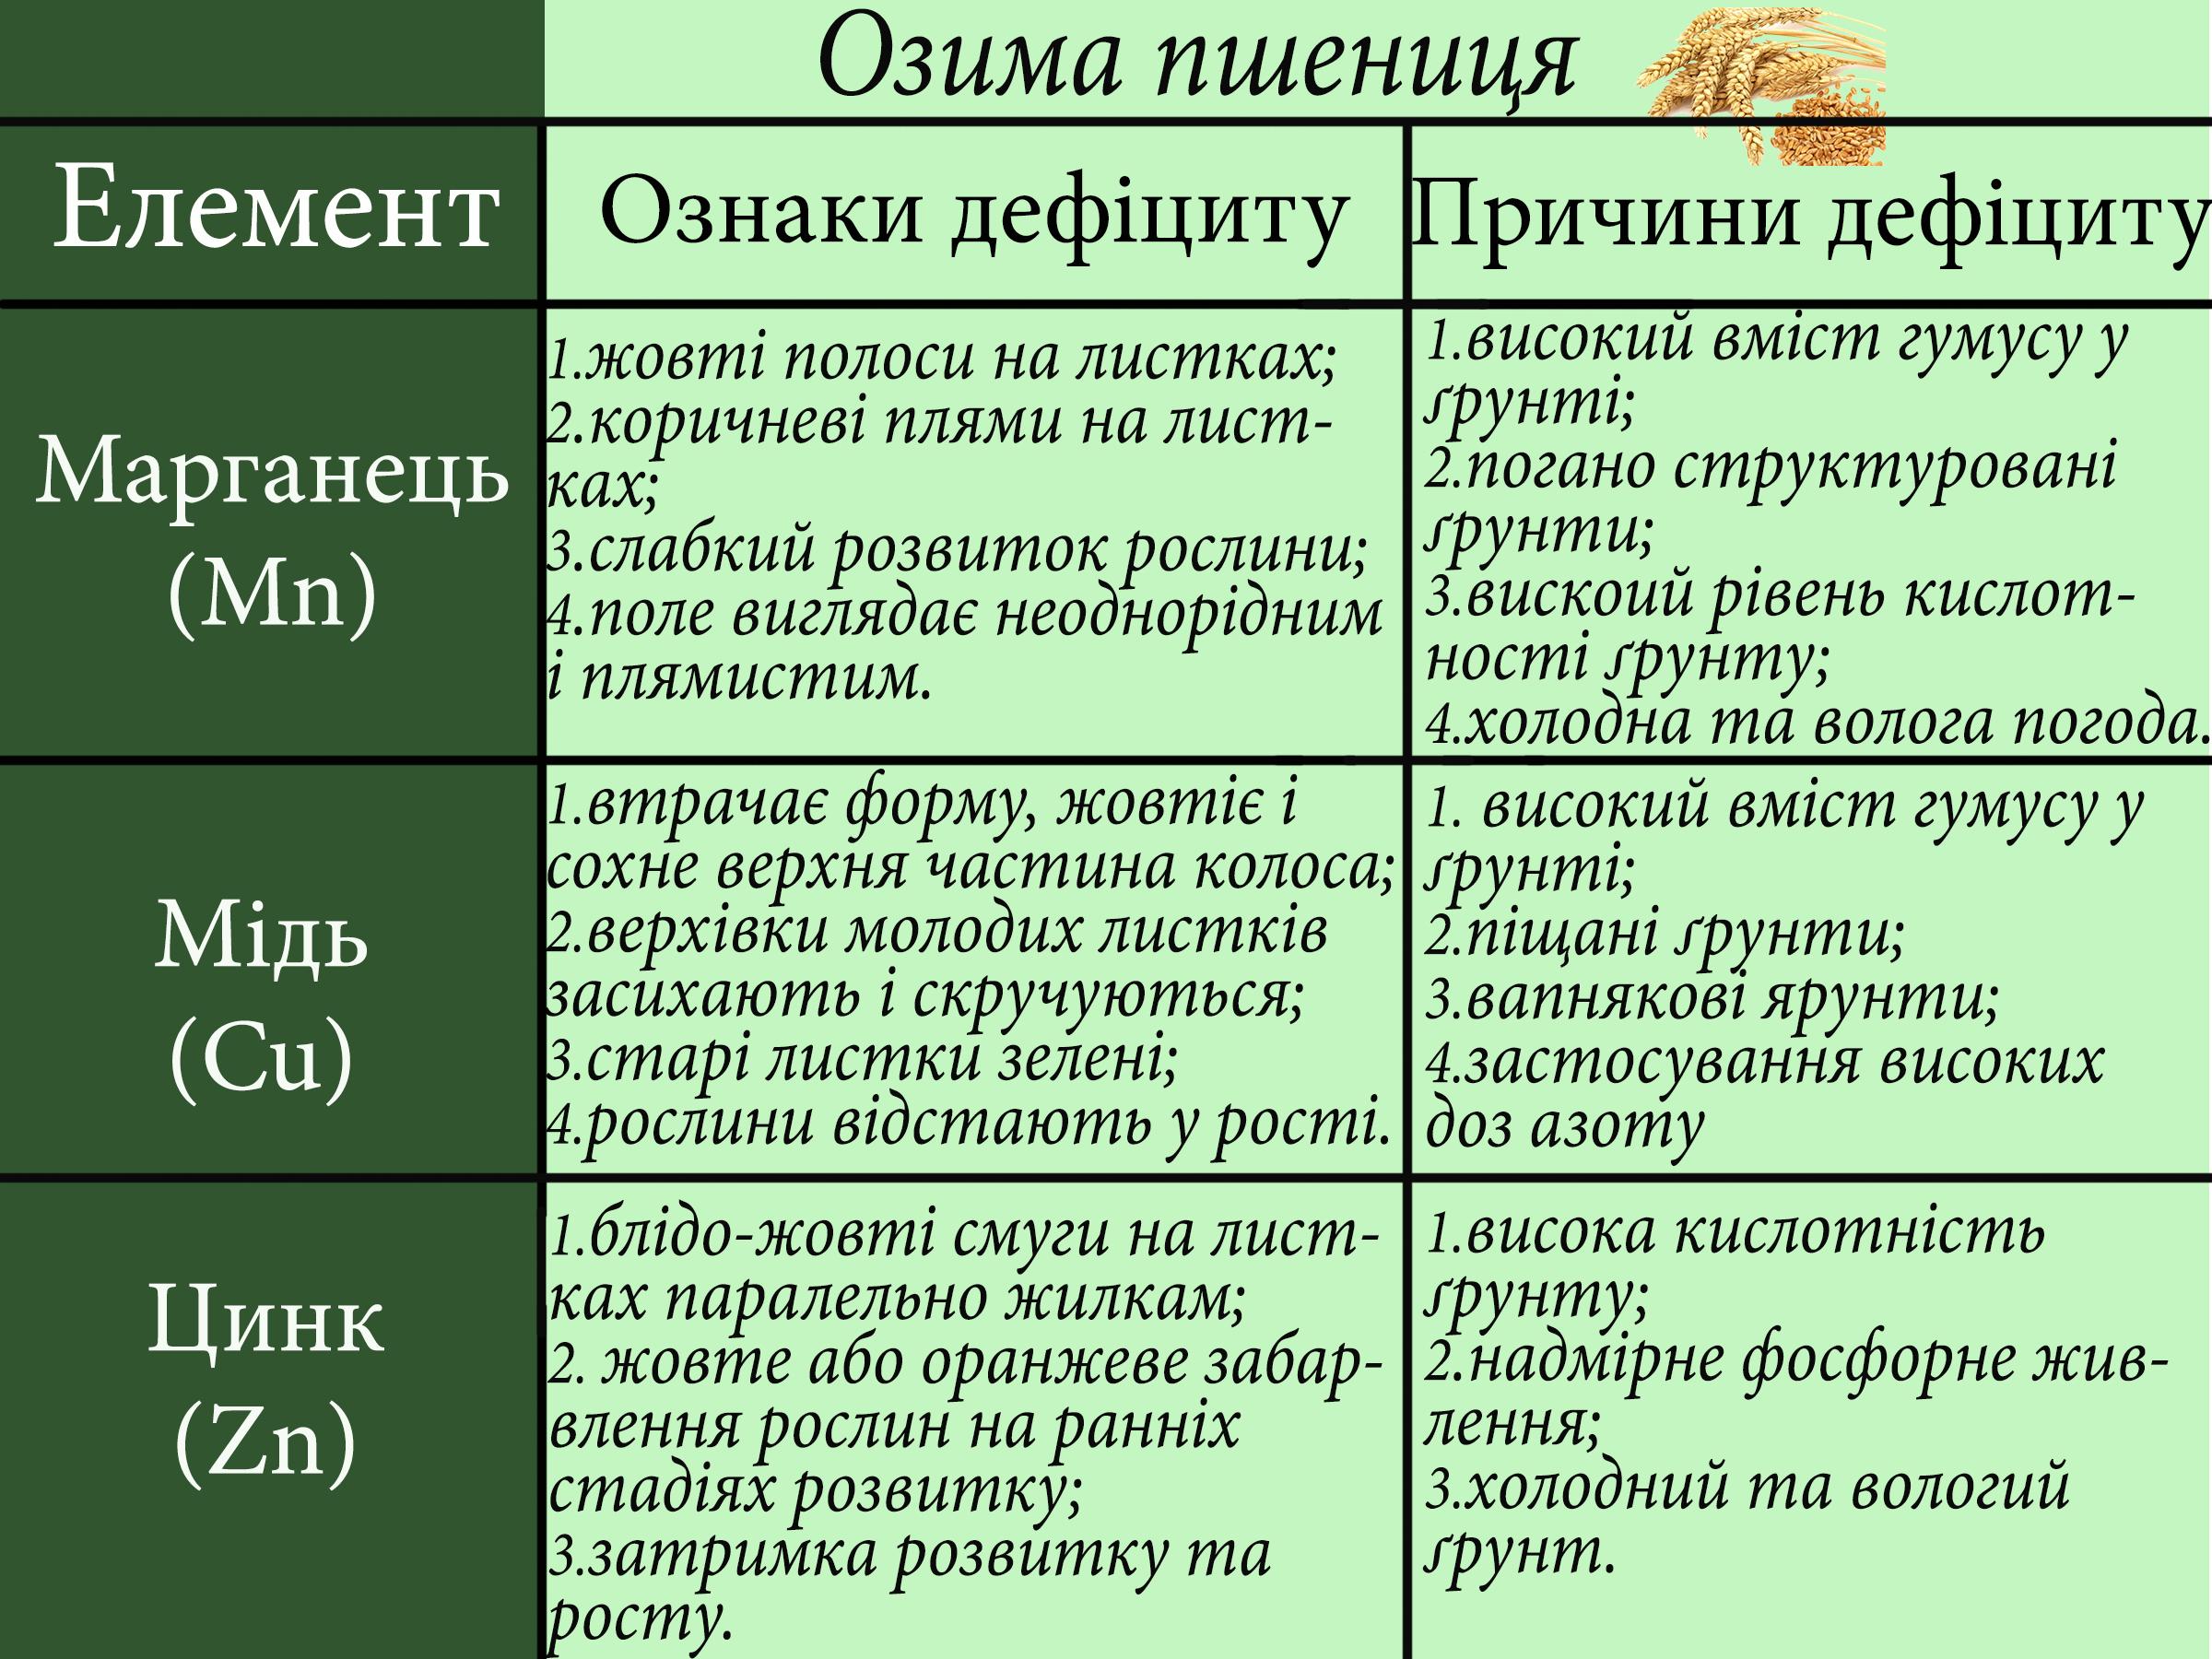 елементи на культурах - озима пшениця